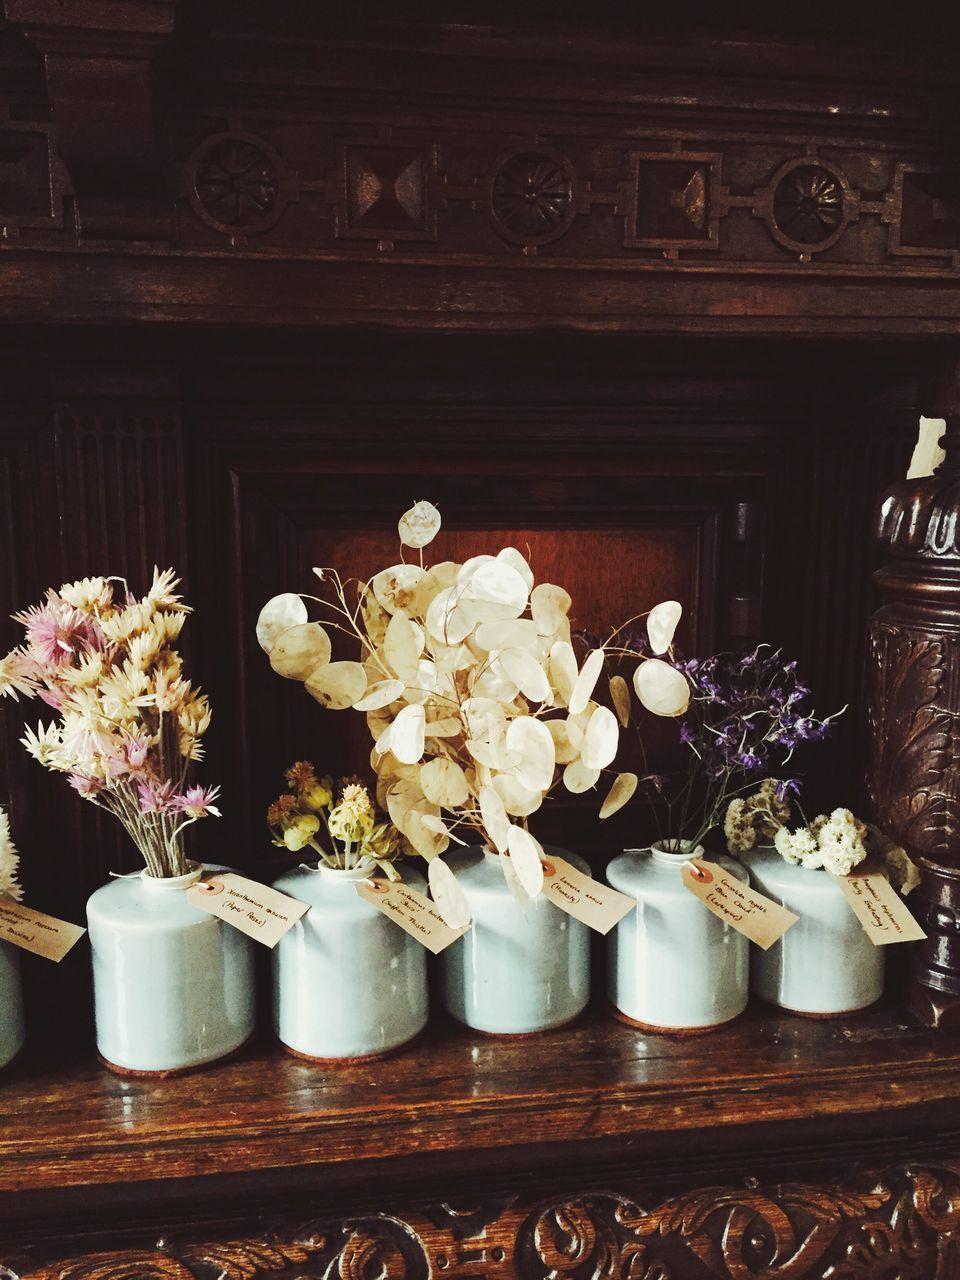 flower, indoors, variation, vase, no people, day, freshness, close-up, flower head